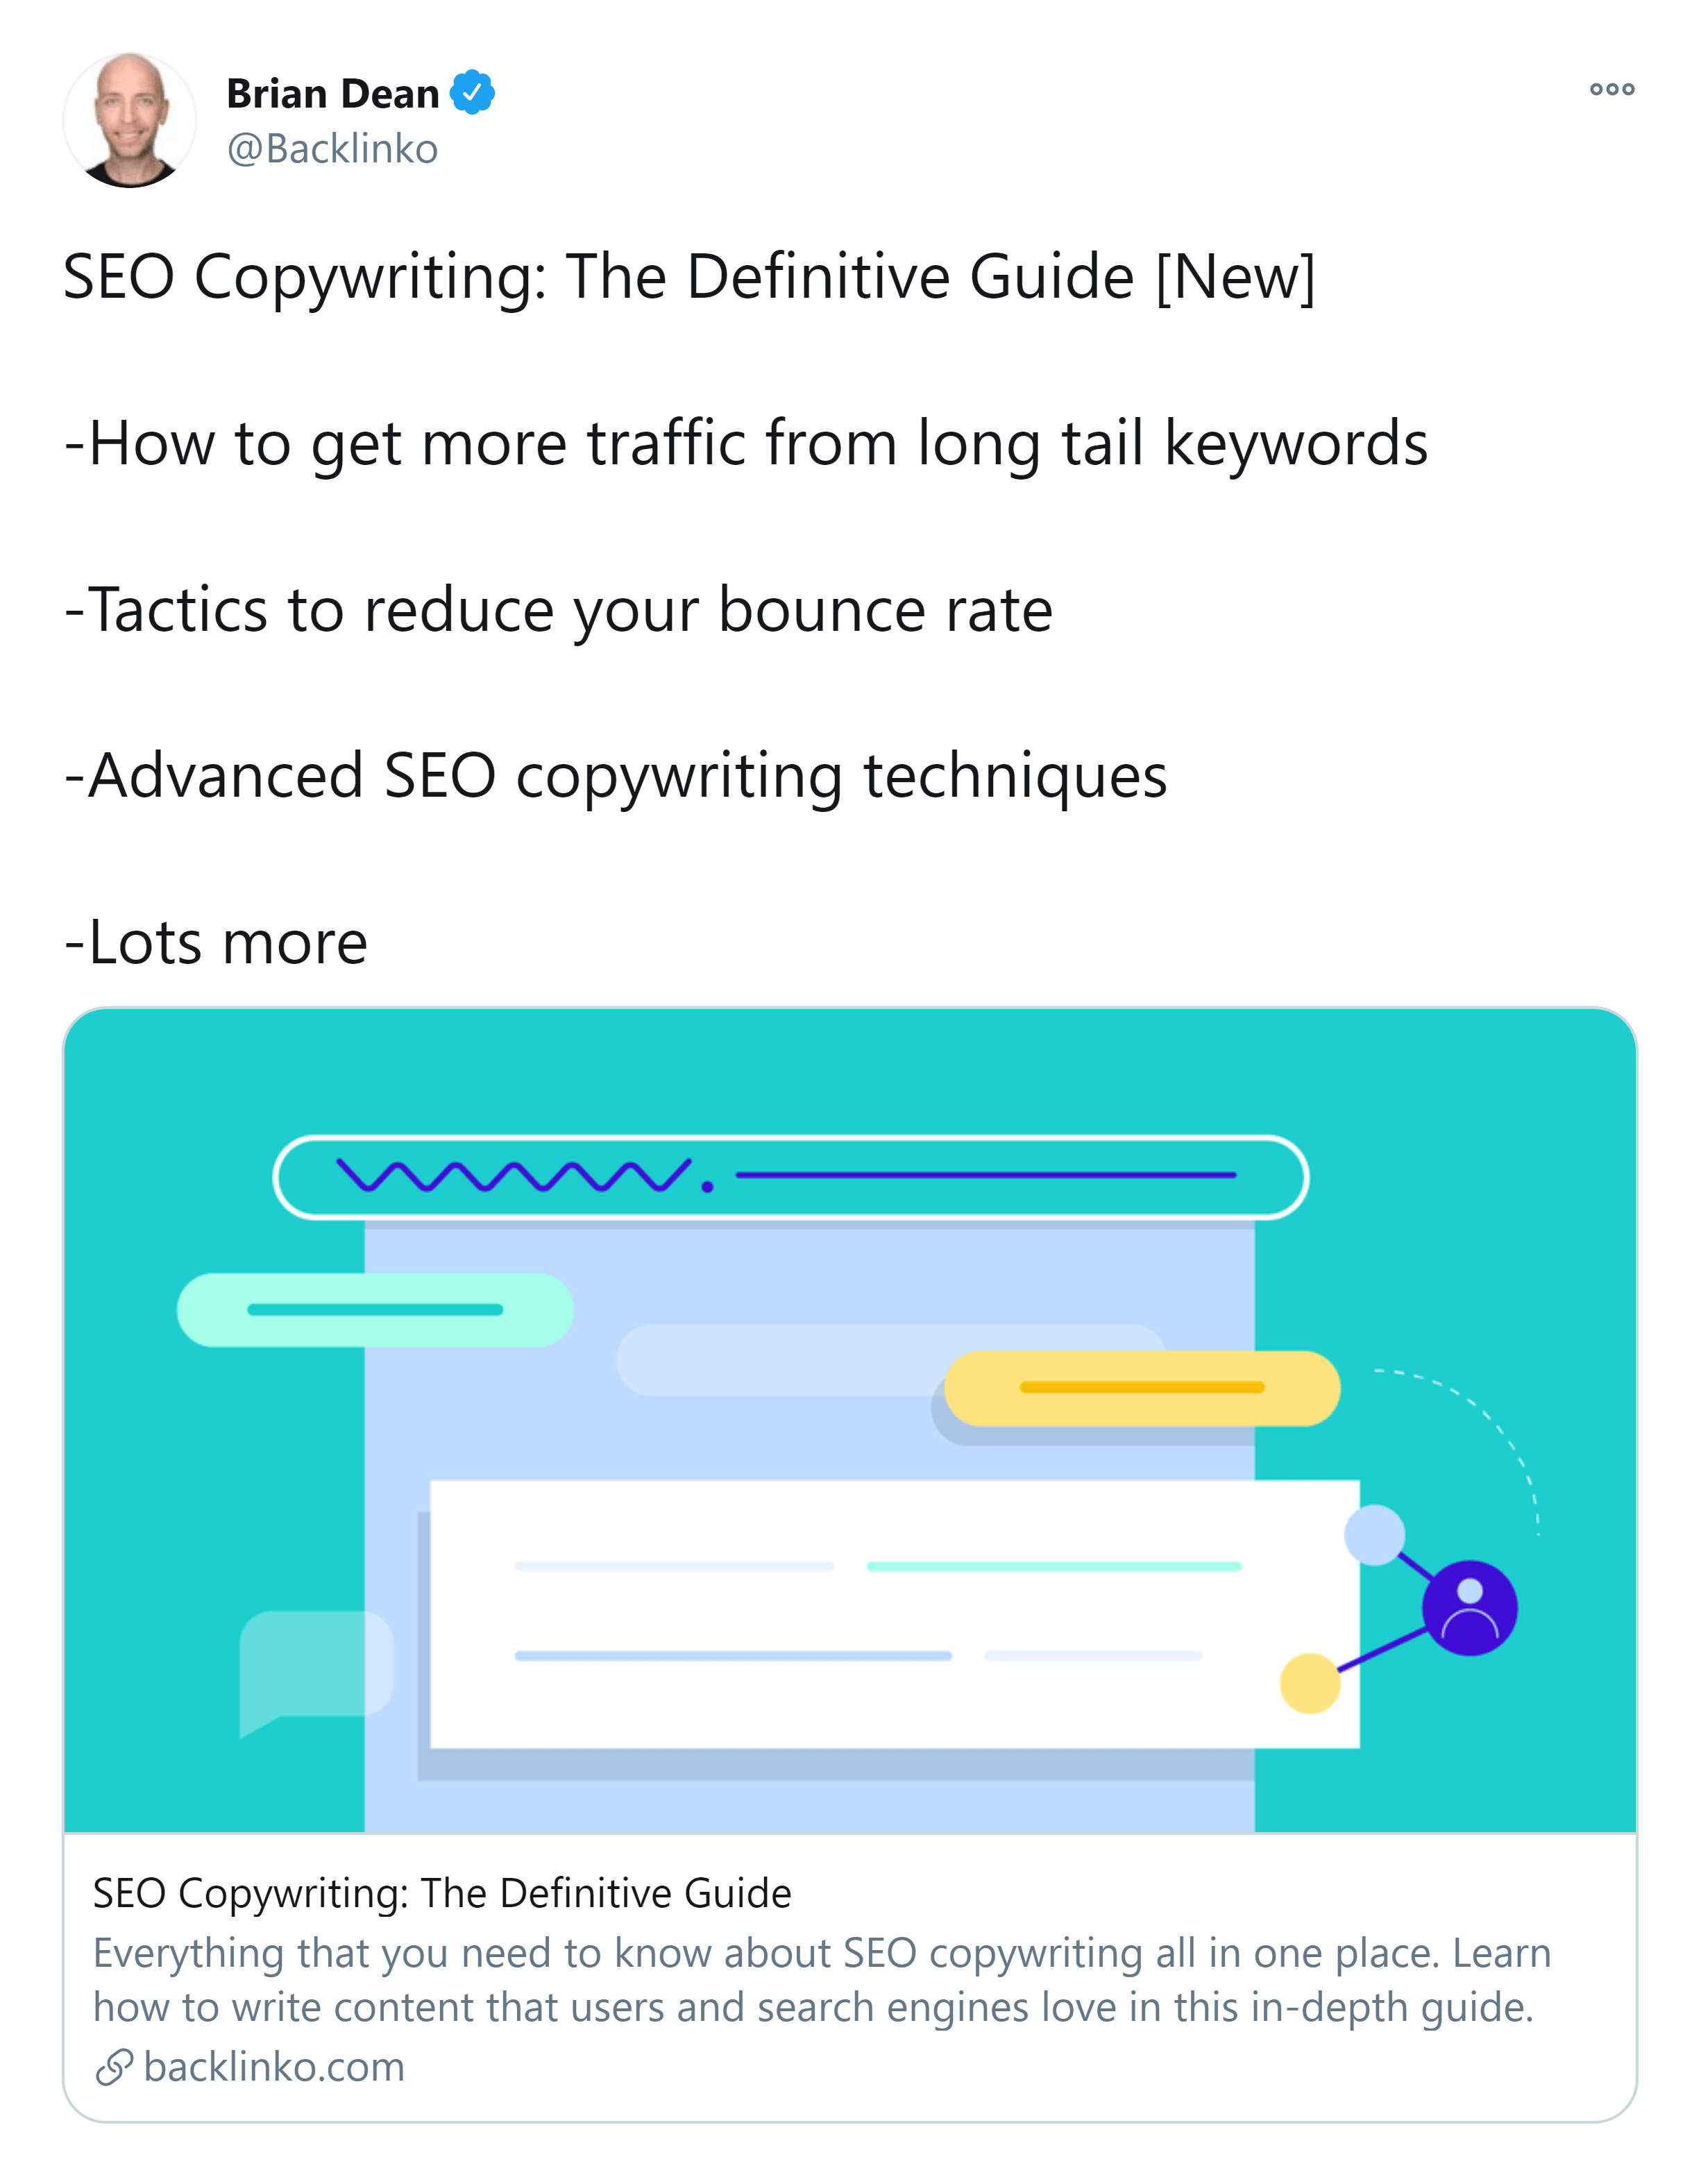 SEO Copywriting post – Twitter share